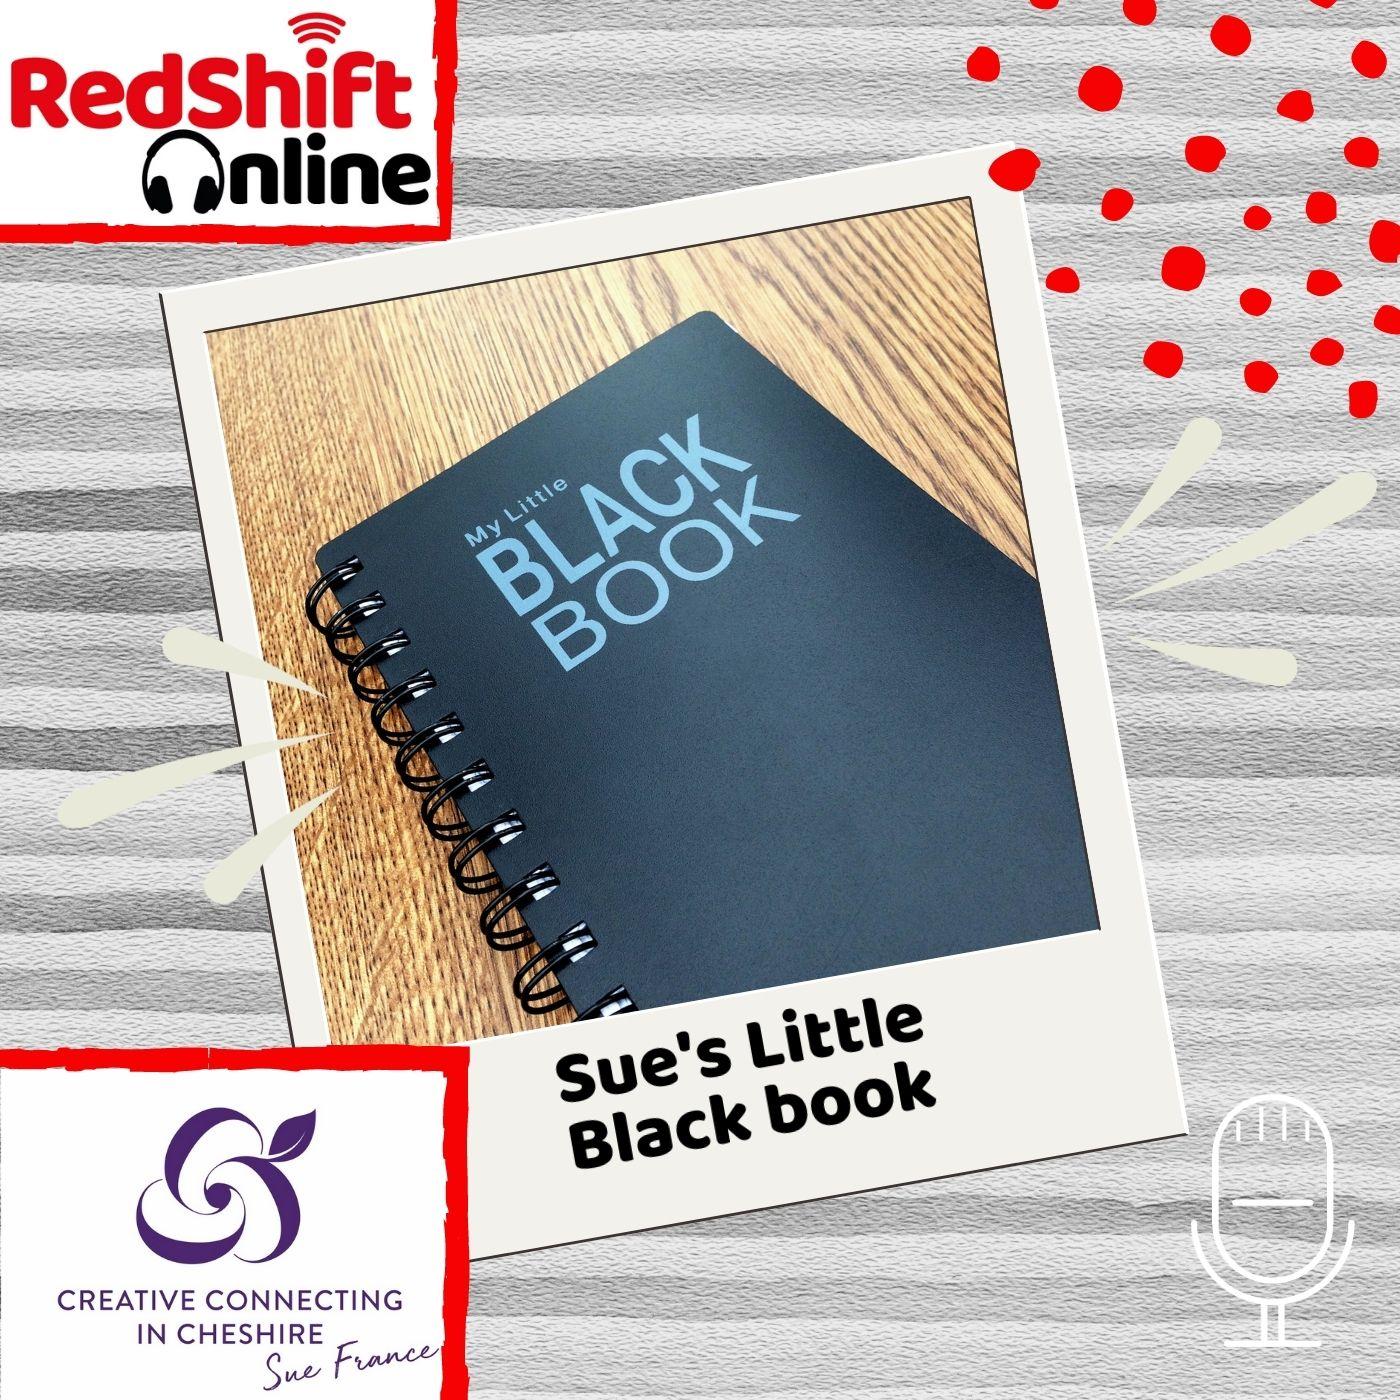 Show artwork for Sue's Little Black Book